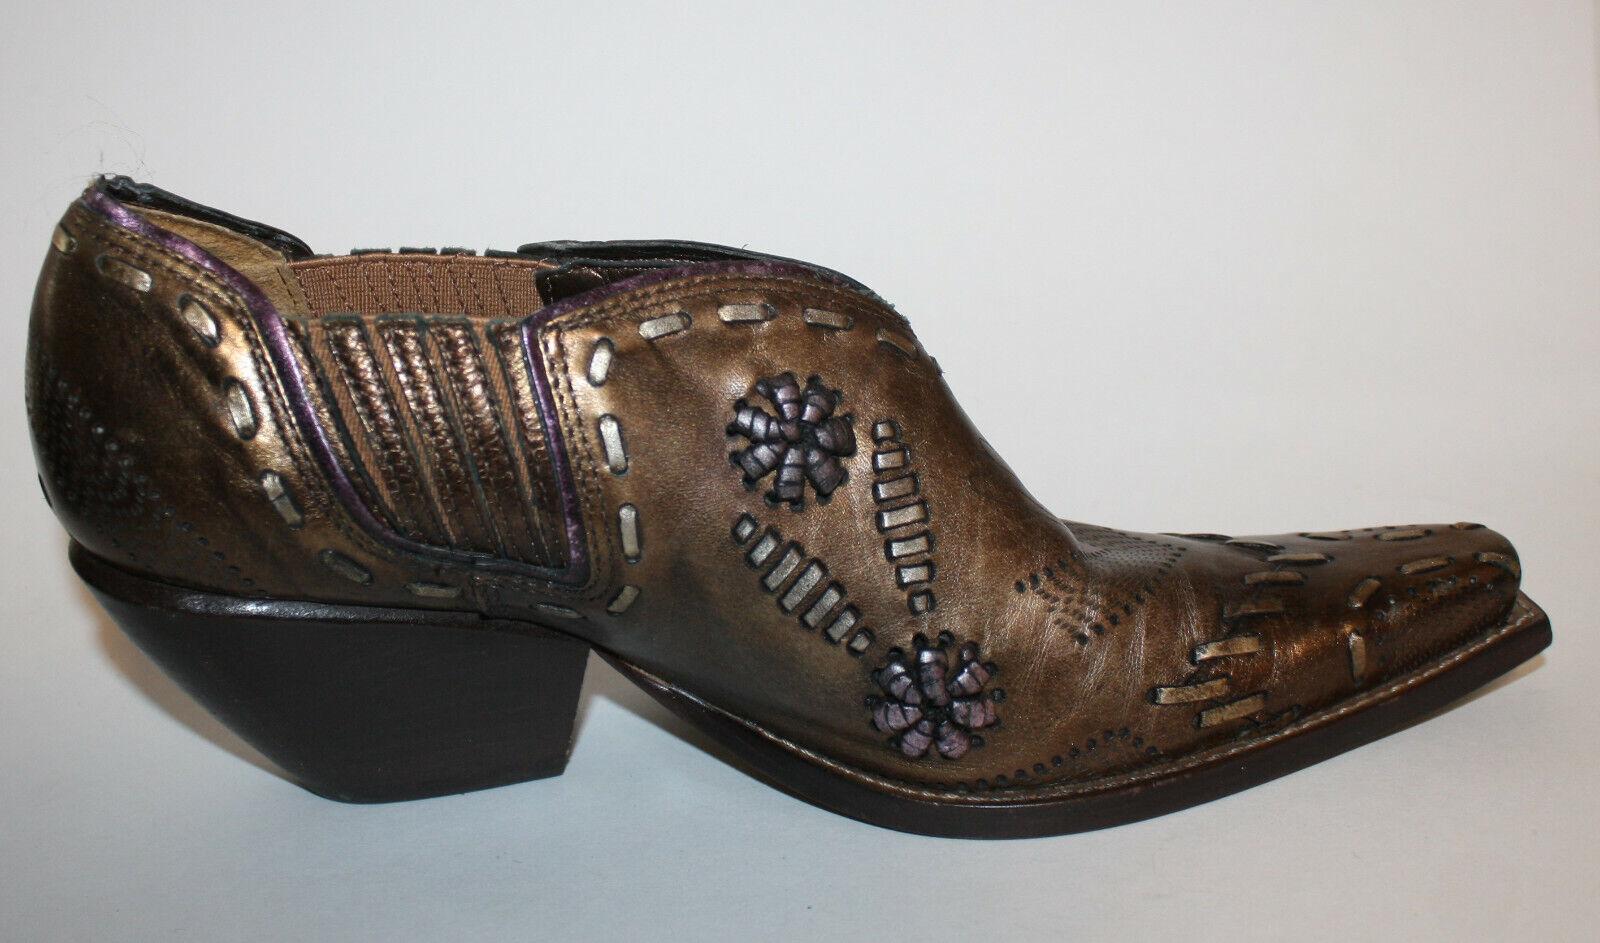 Bronze gold Leather WESTERN WESTERN WESTERN Ankle Boots 6.5B LN Embellished Trim Floral BCBG d823ce